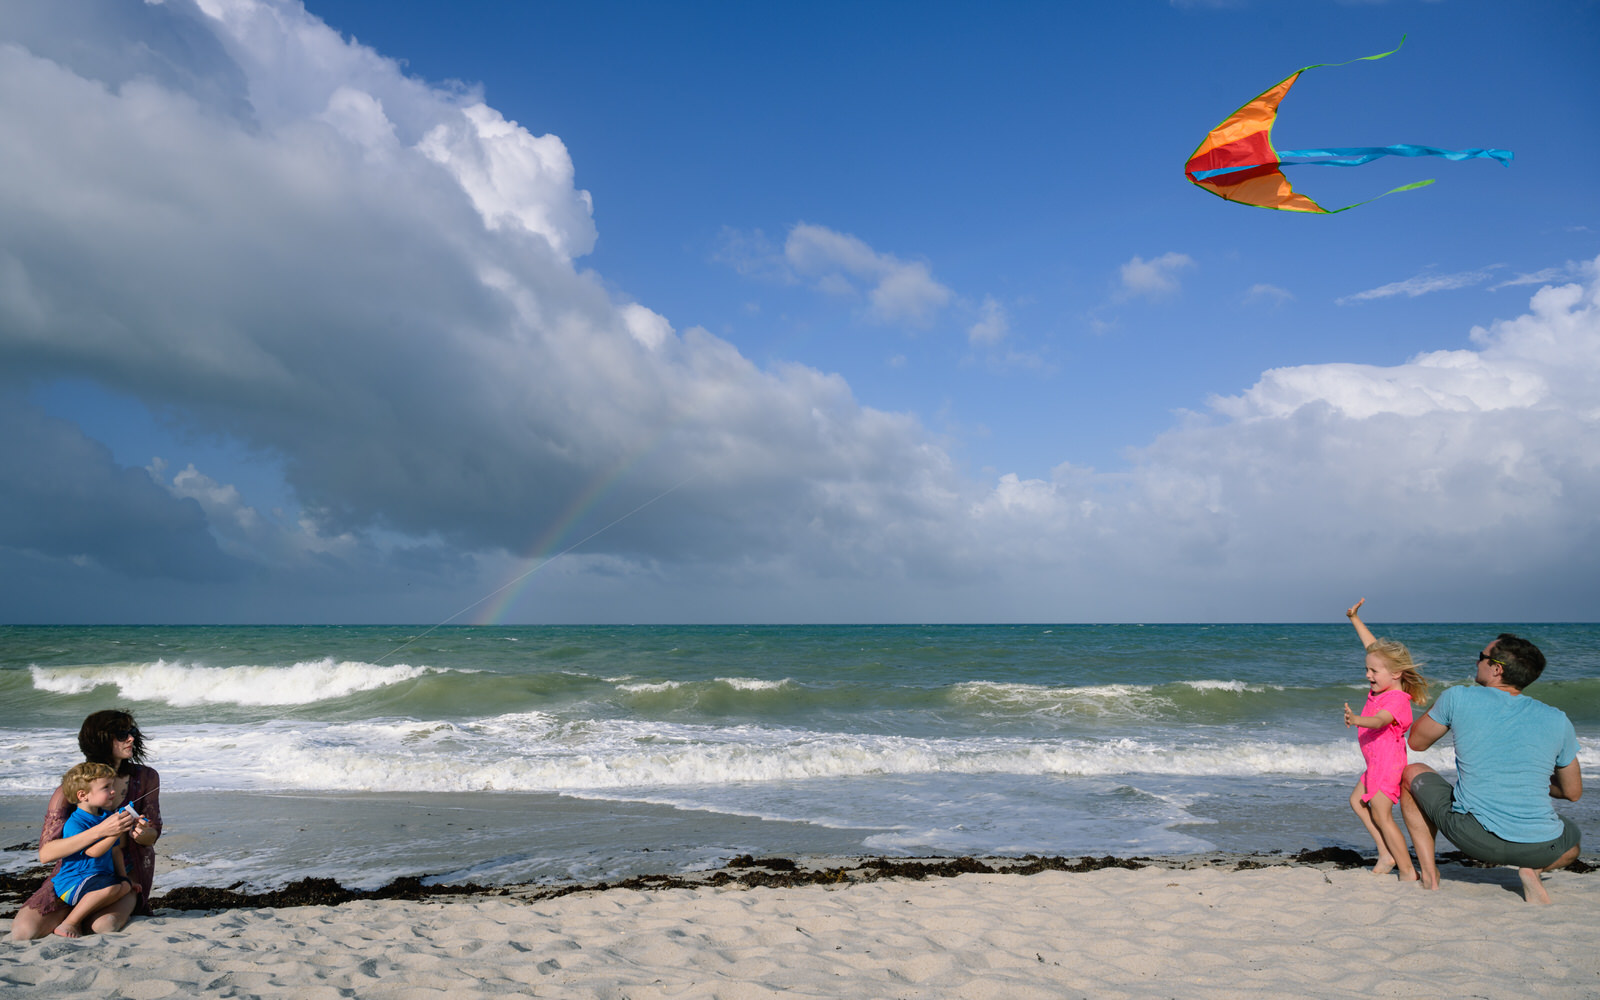 family flies a kite at the beach with a rainbow over the ocean